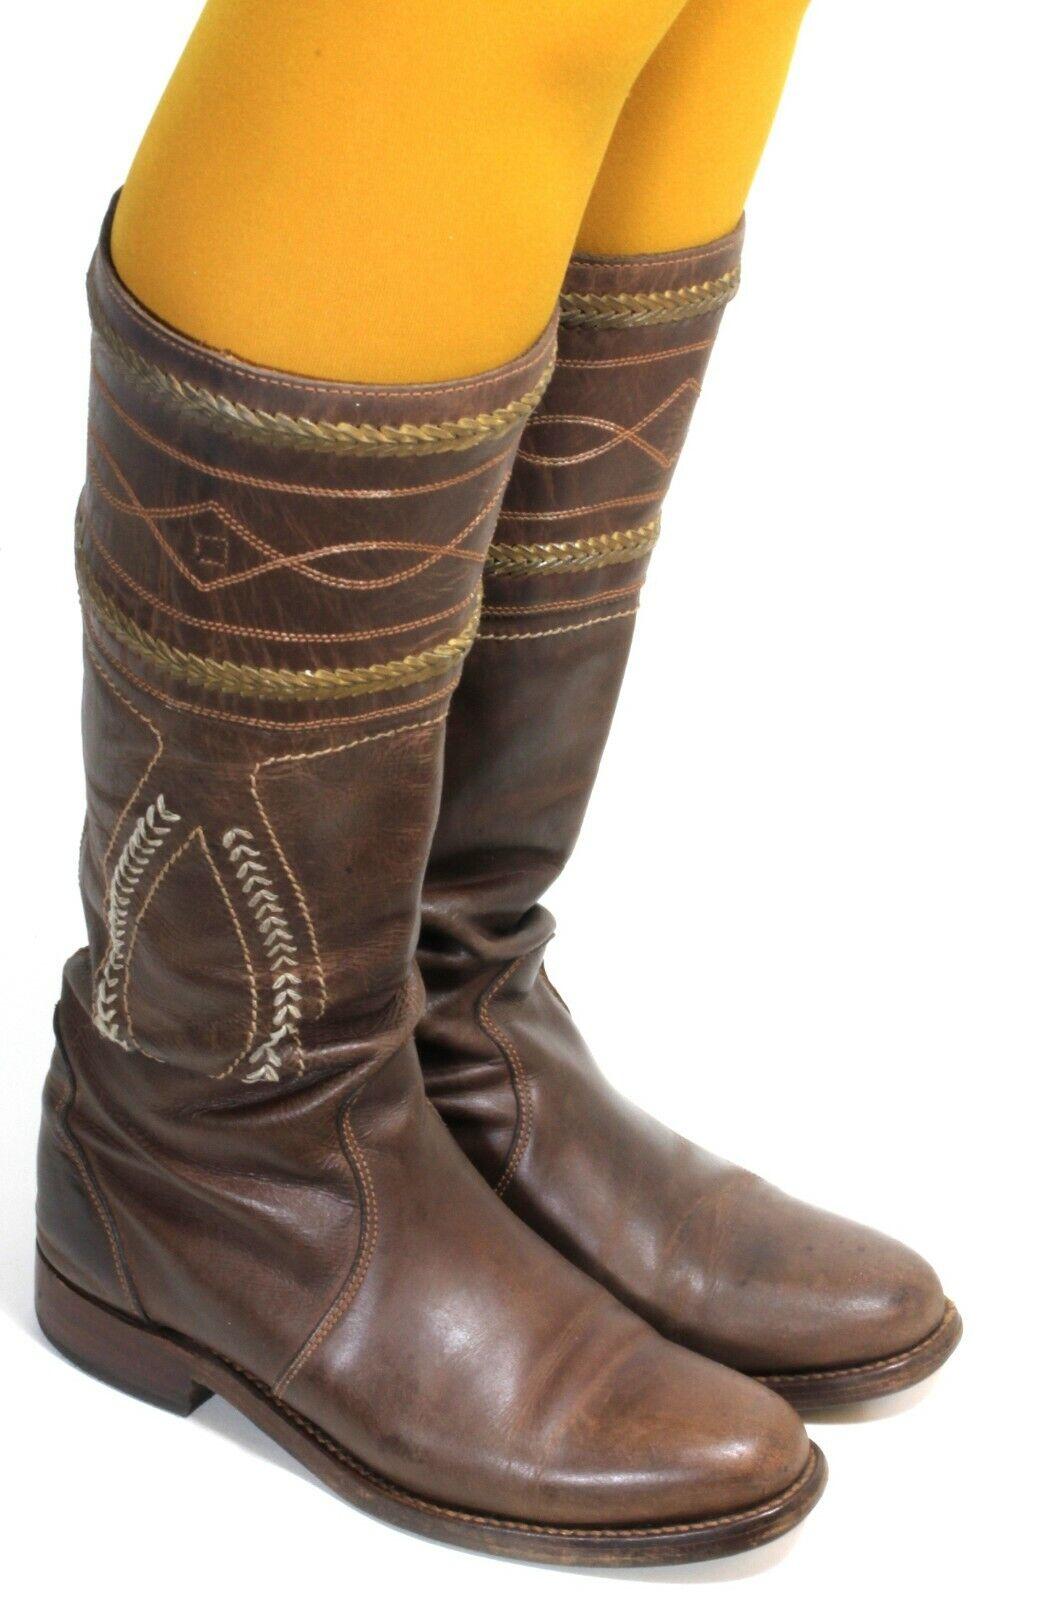 Westernstiefel Cowboystiefel Catalan Style Line Dance Sancho Sancho Sancho 10311 8578 37  | Auf Verkauf  1cc66f